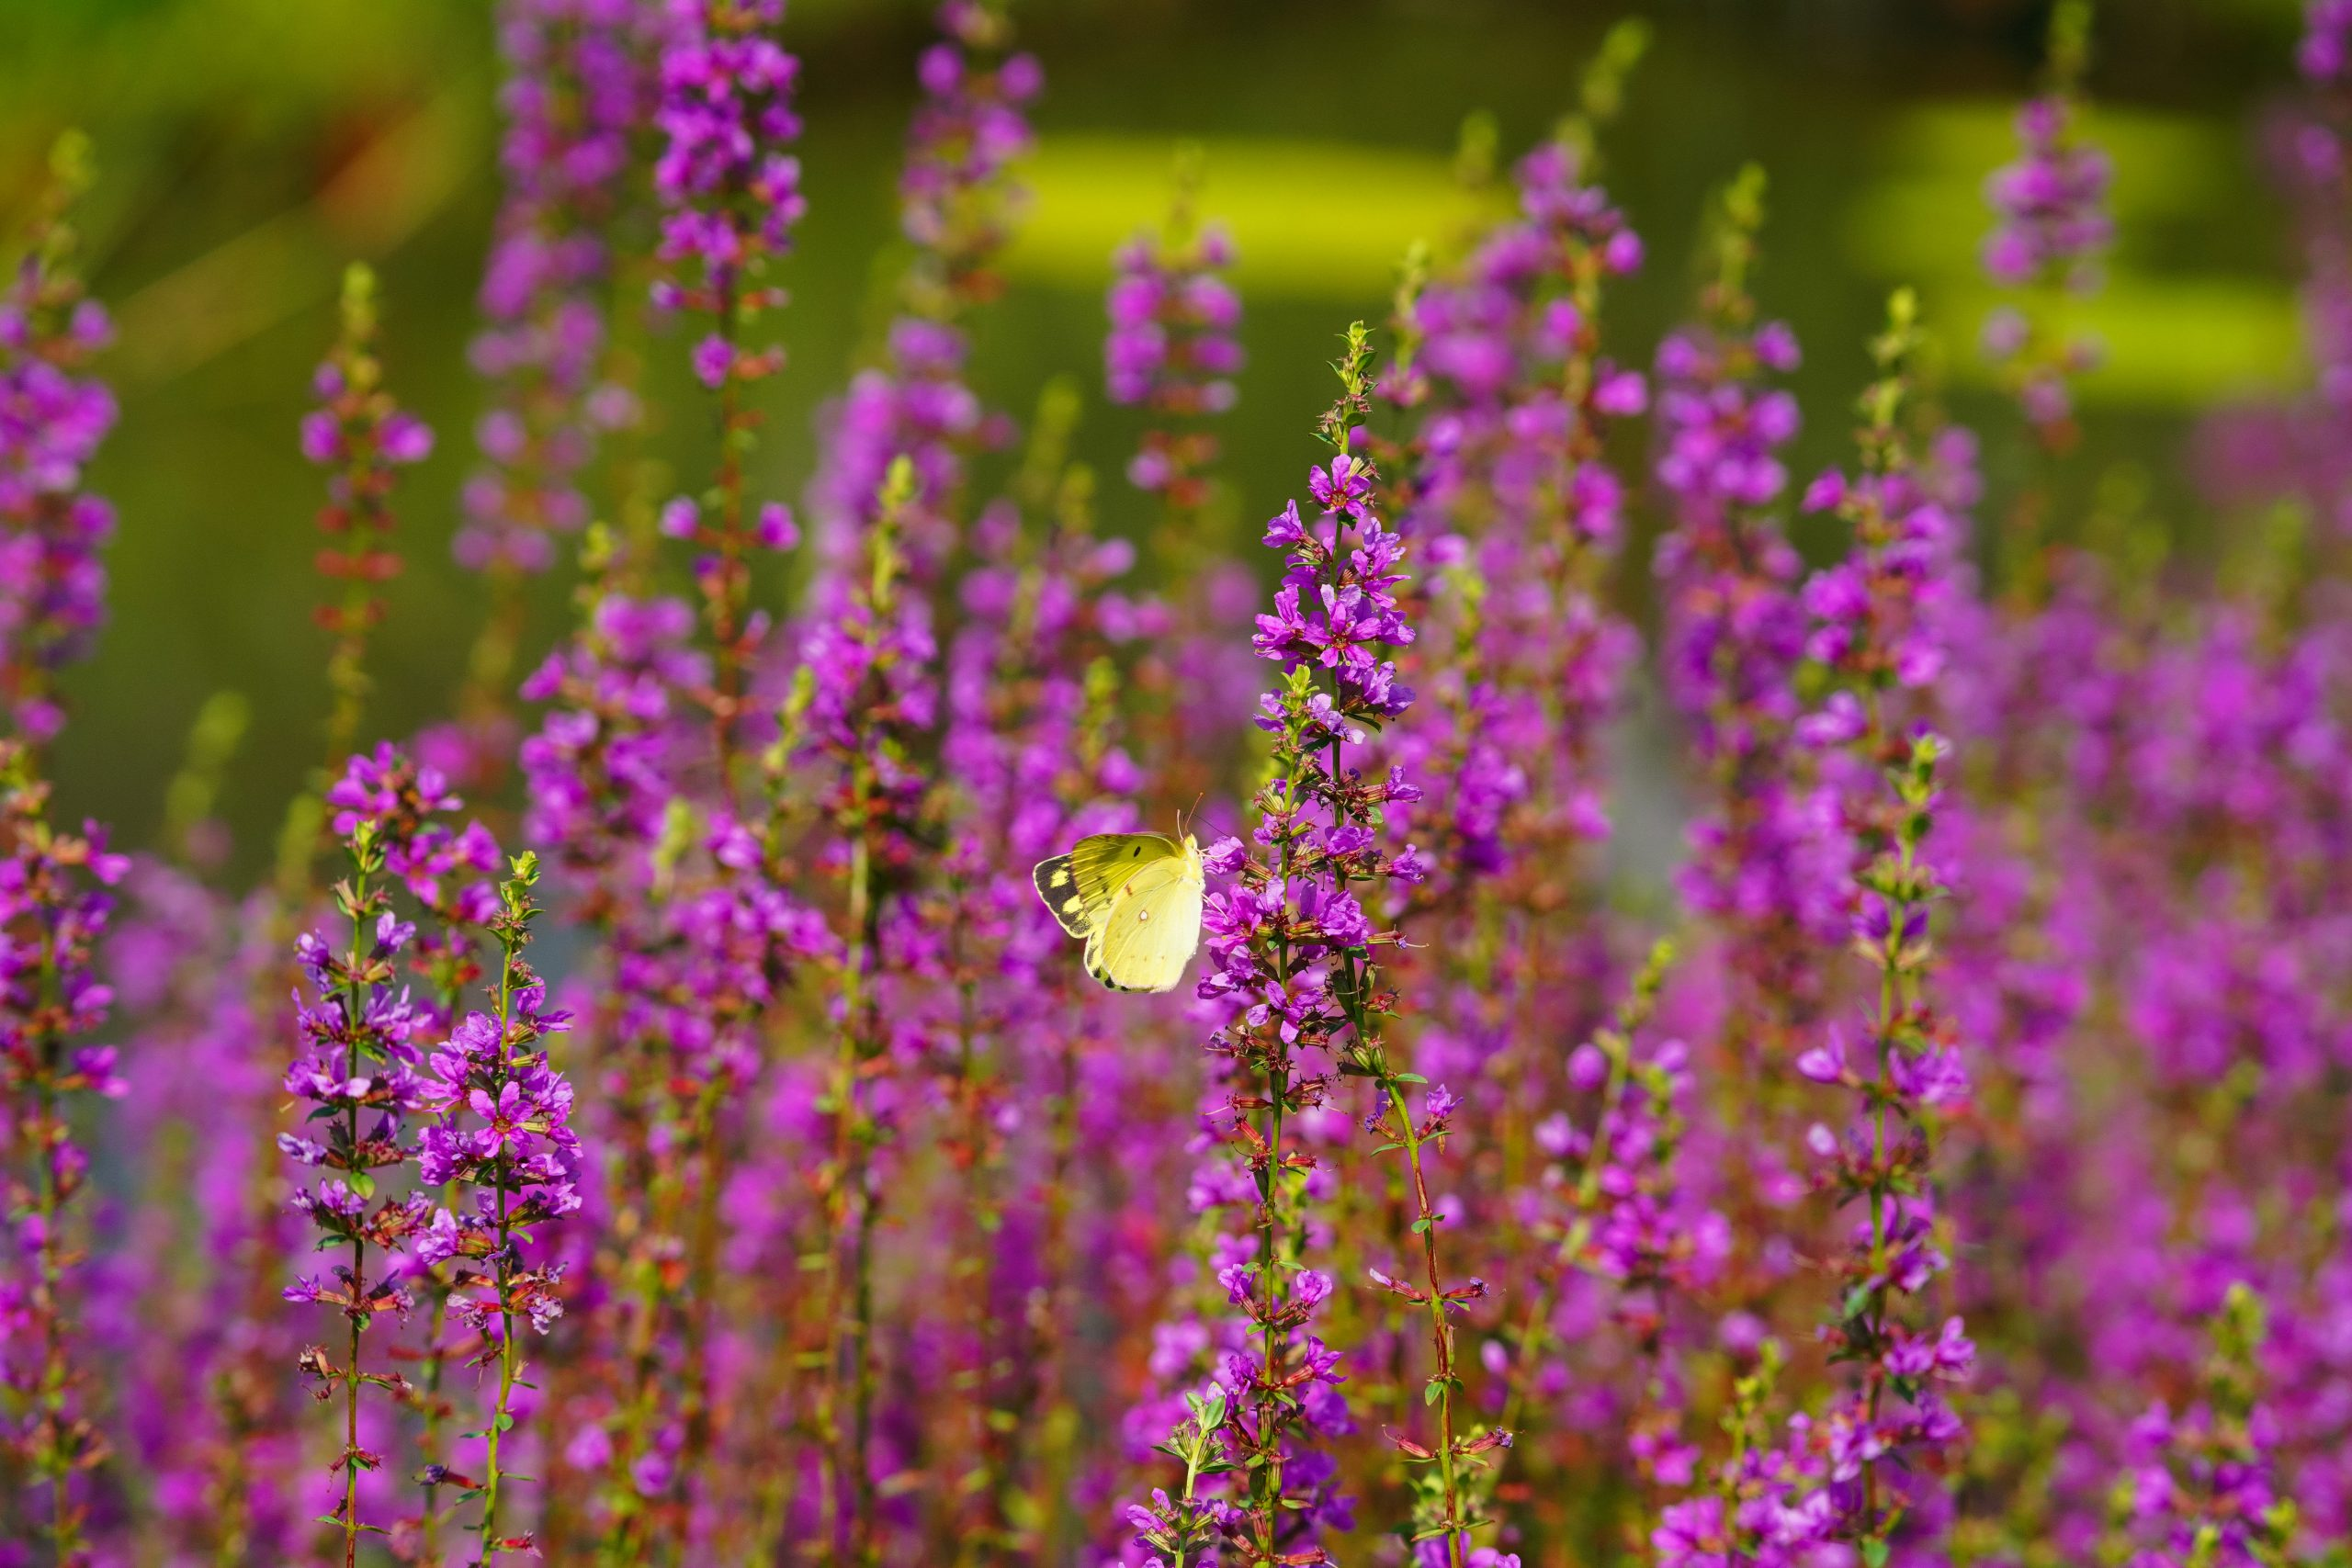 【SONY】この季節に咲く花(34)